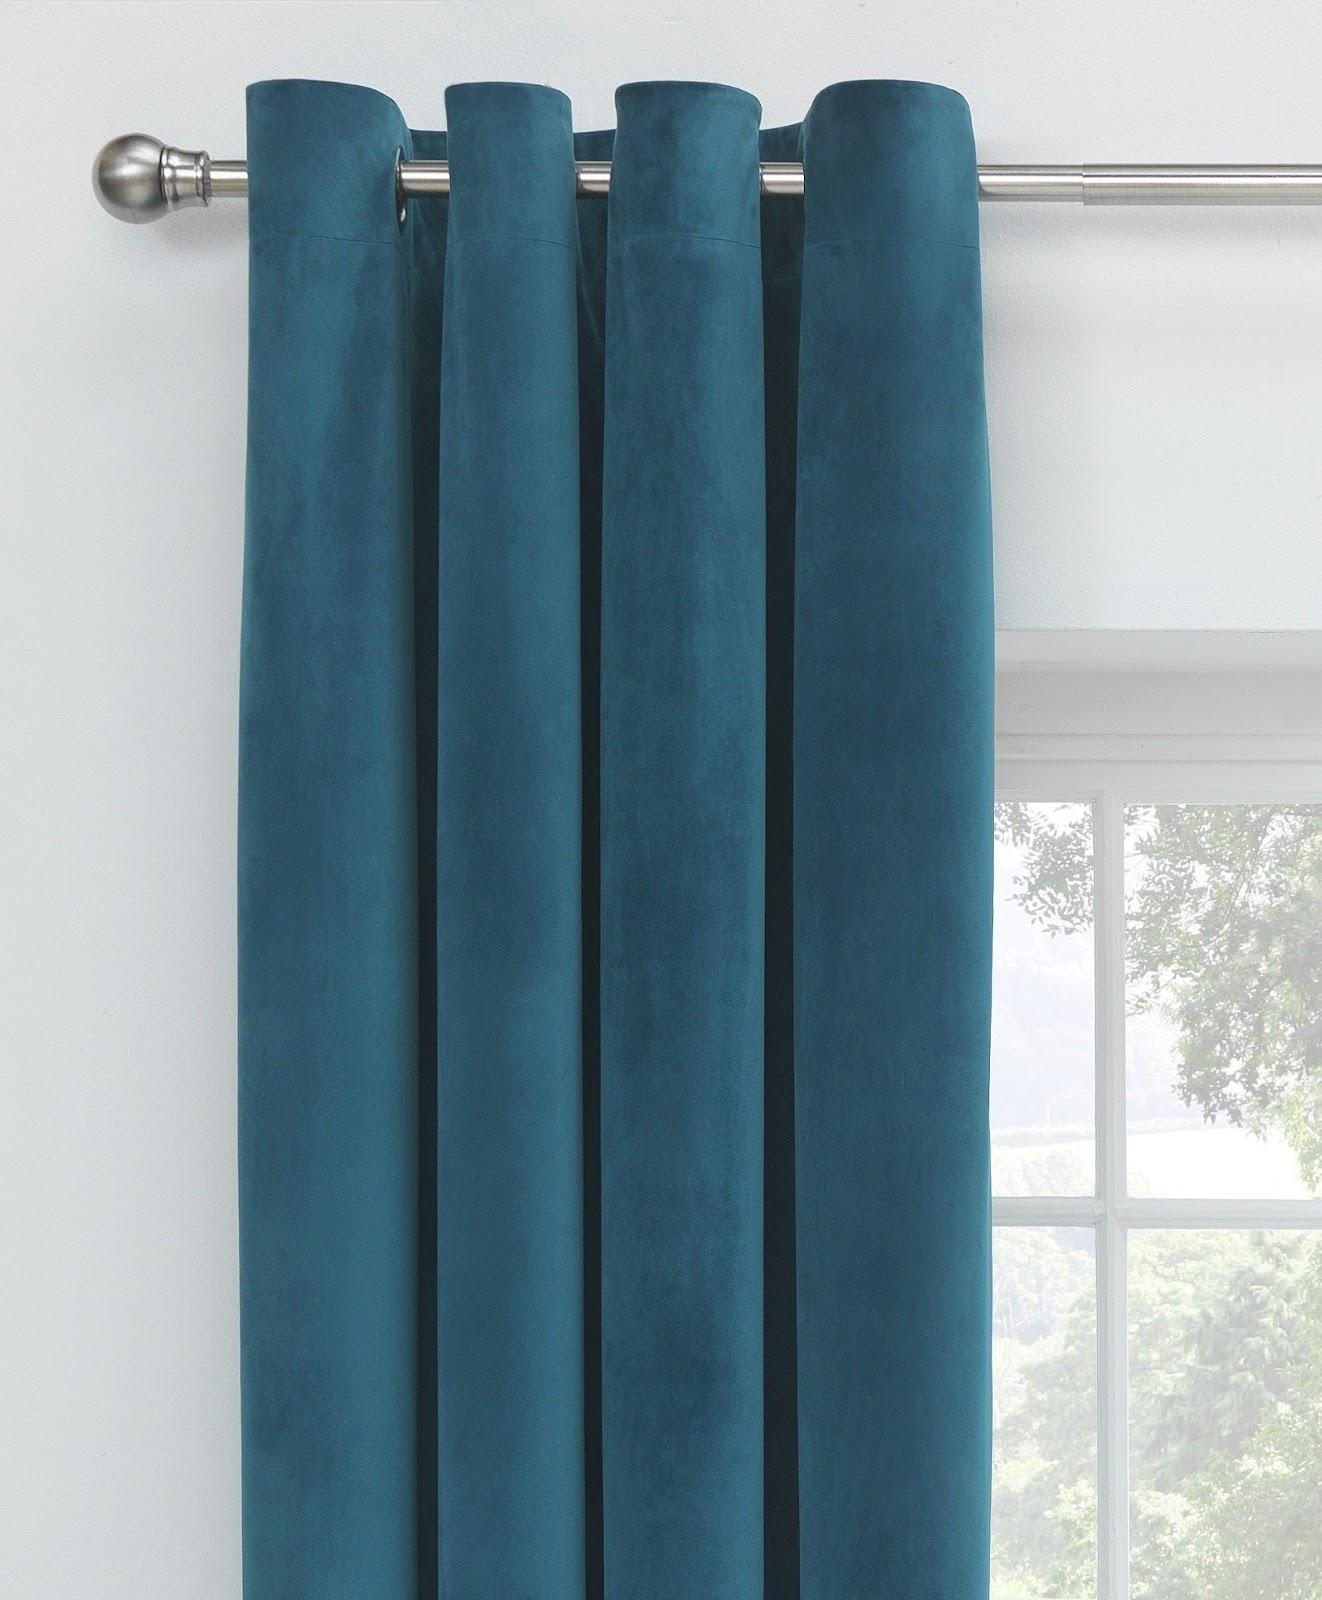 Bathroom Curtain Patterns Pole Poles Rod Rods